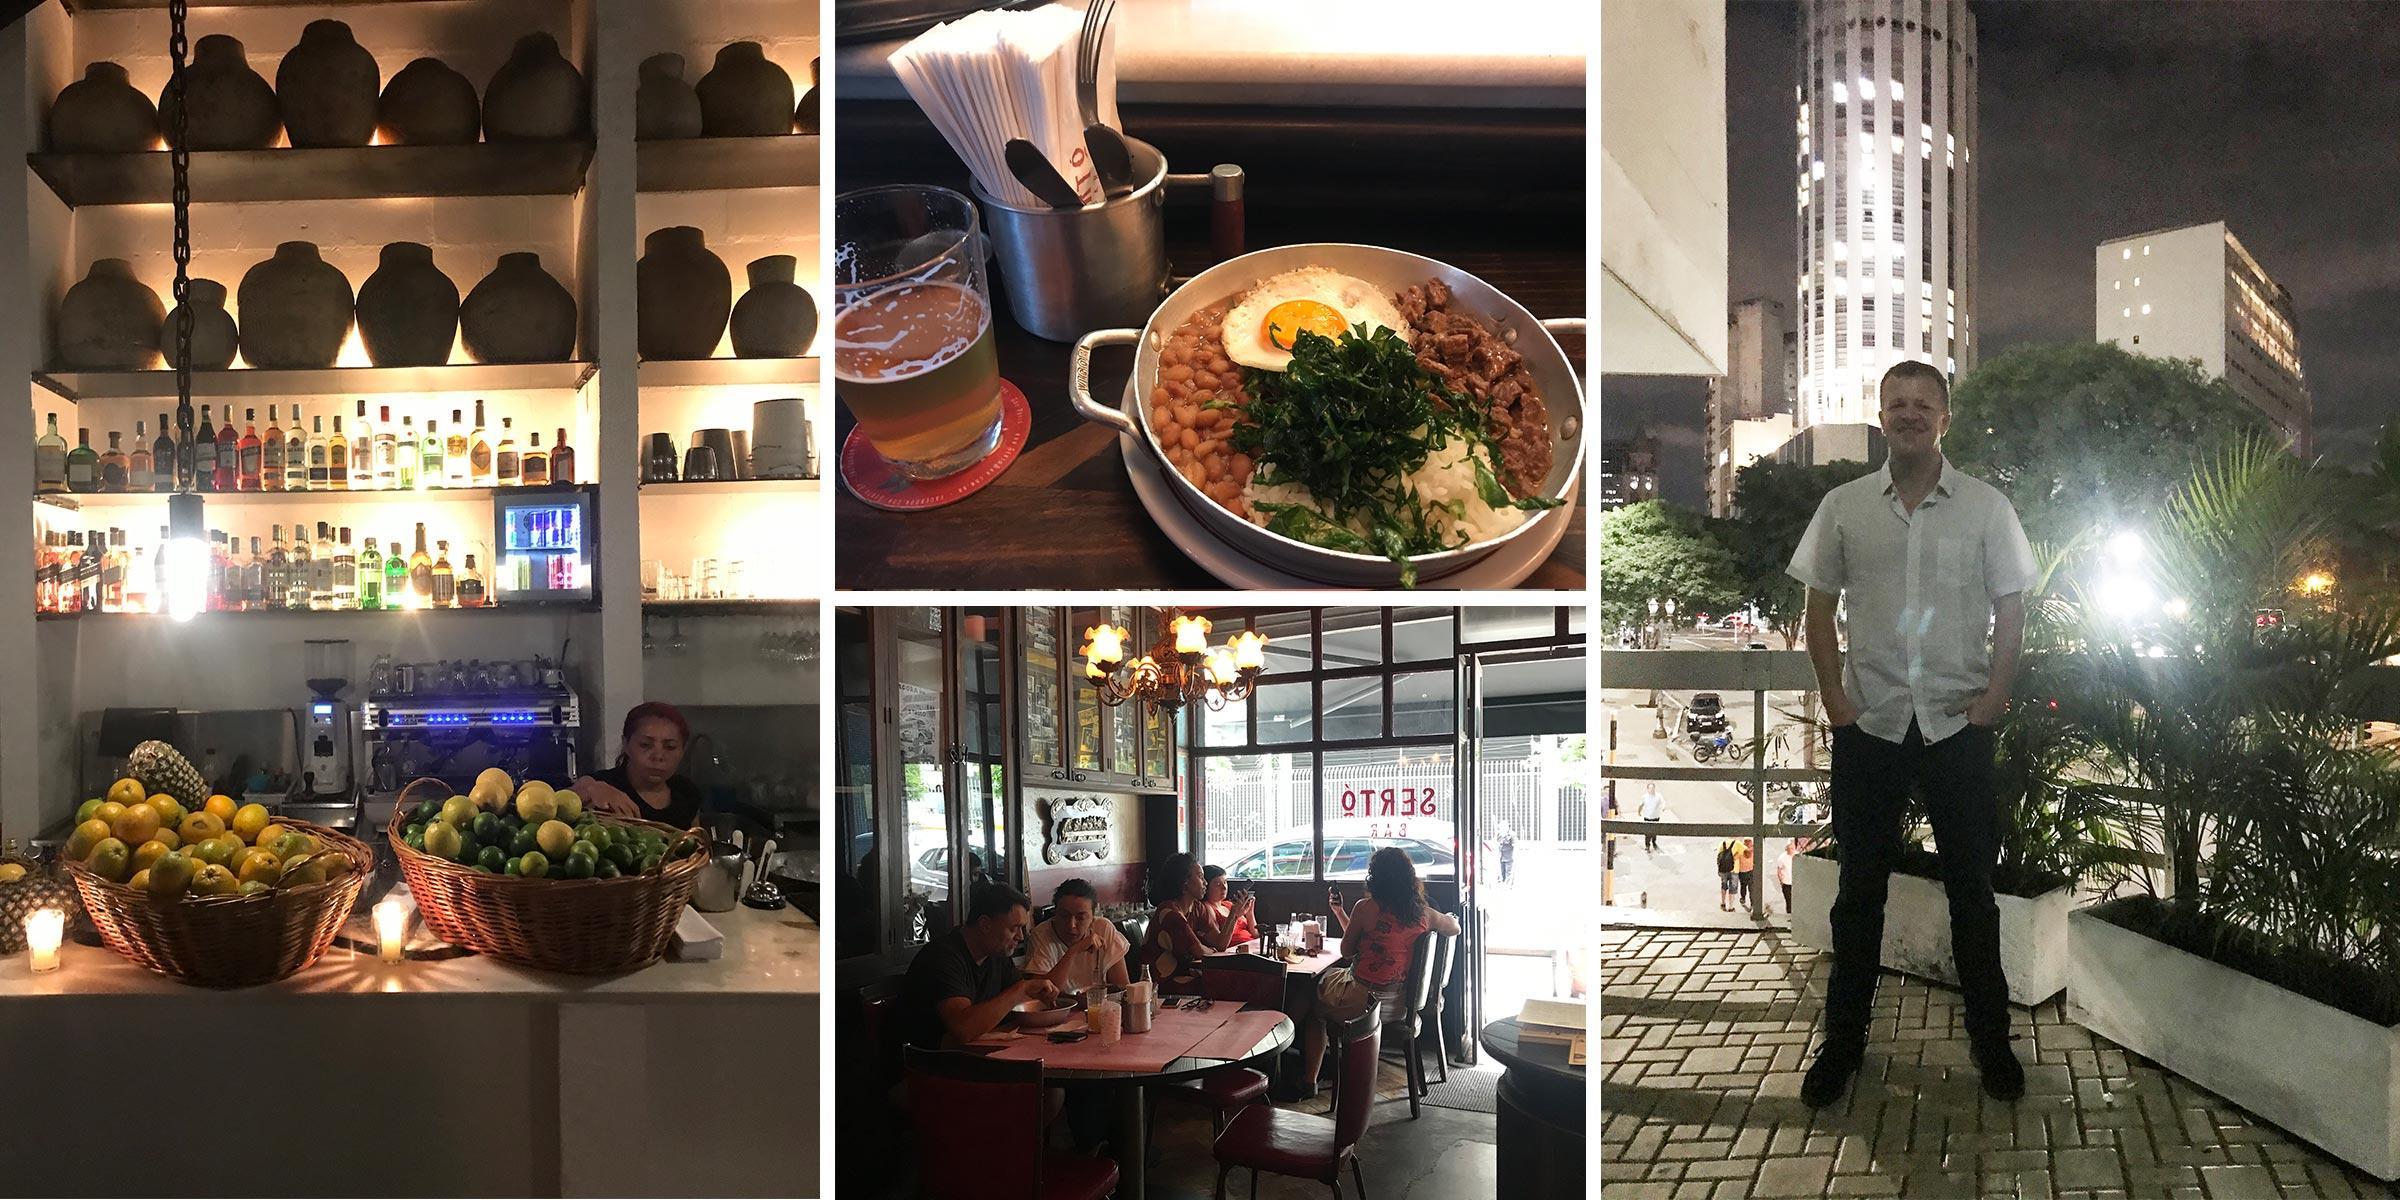 Serto Bar in Sao Paulo